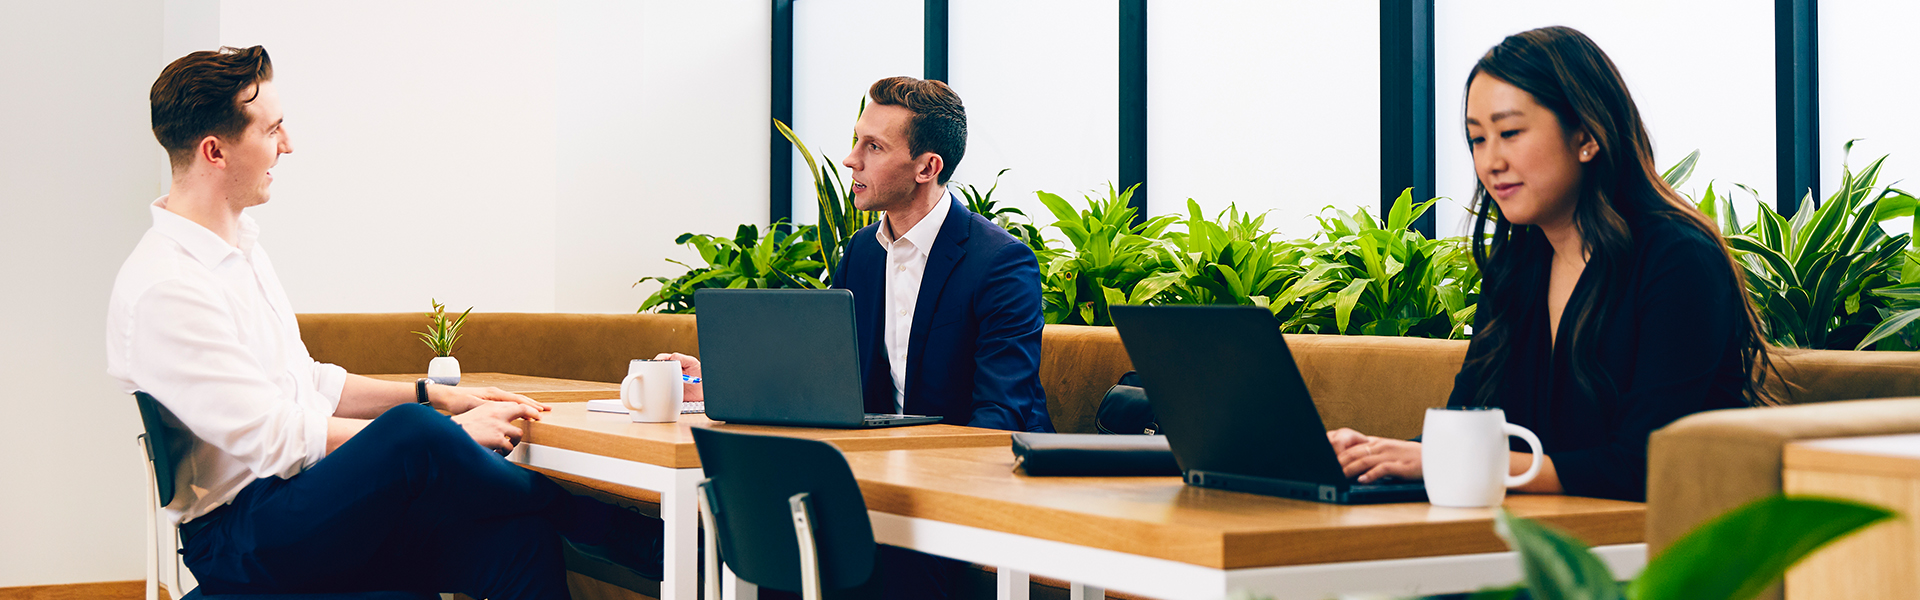 Employees working in an open office.